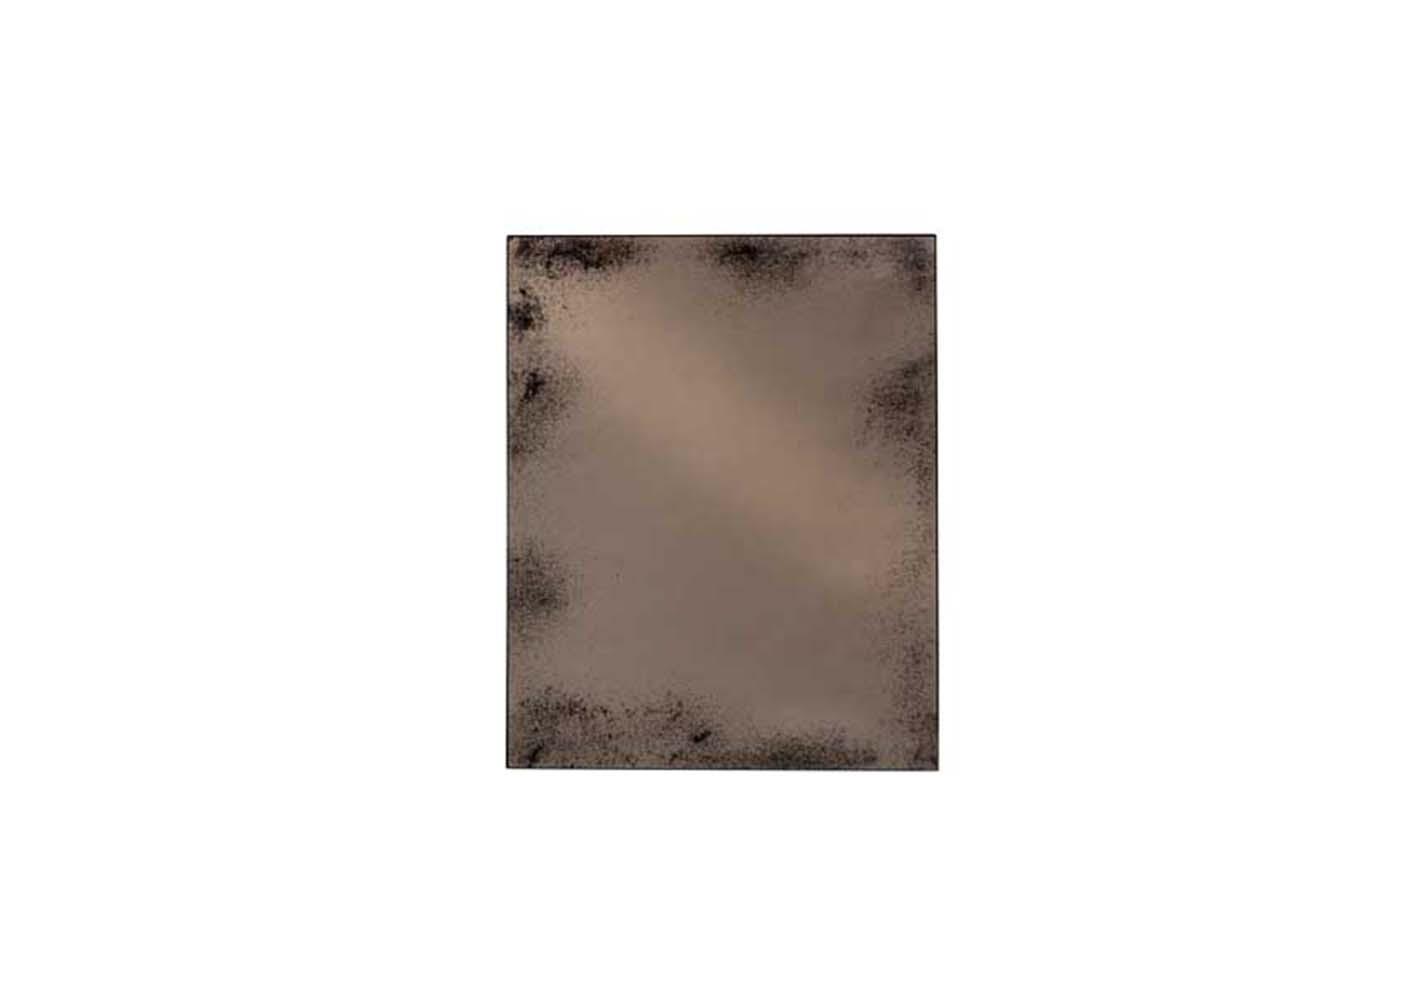 Miroir rectangulaire Bronze XL - NOTRE MONDE